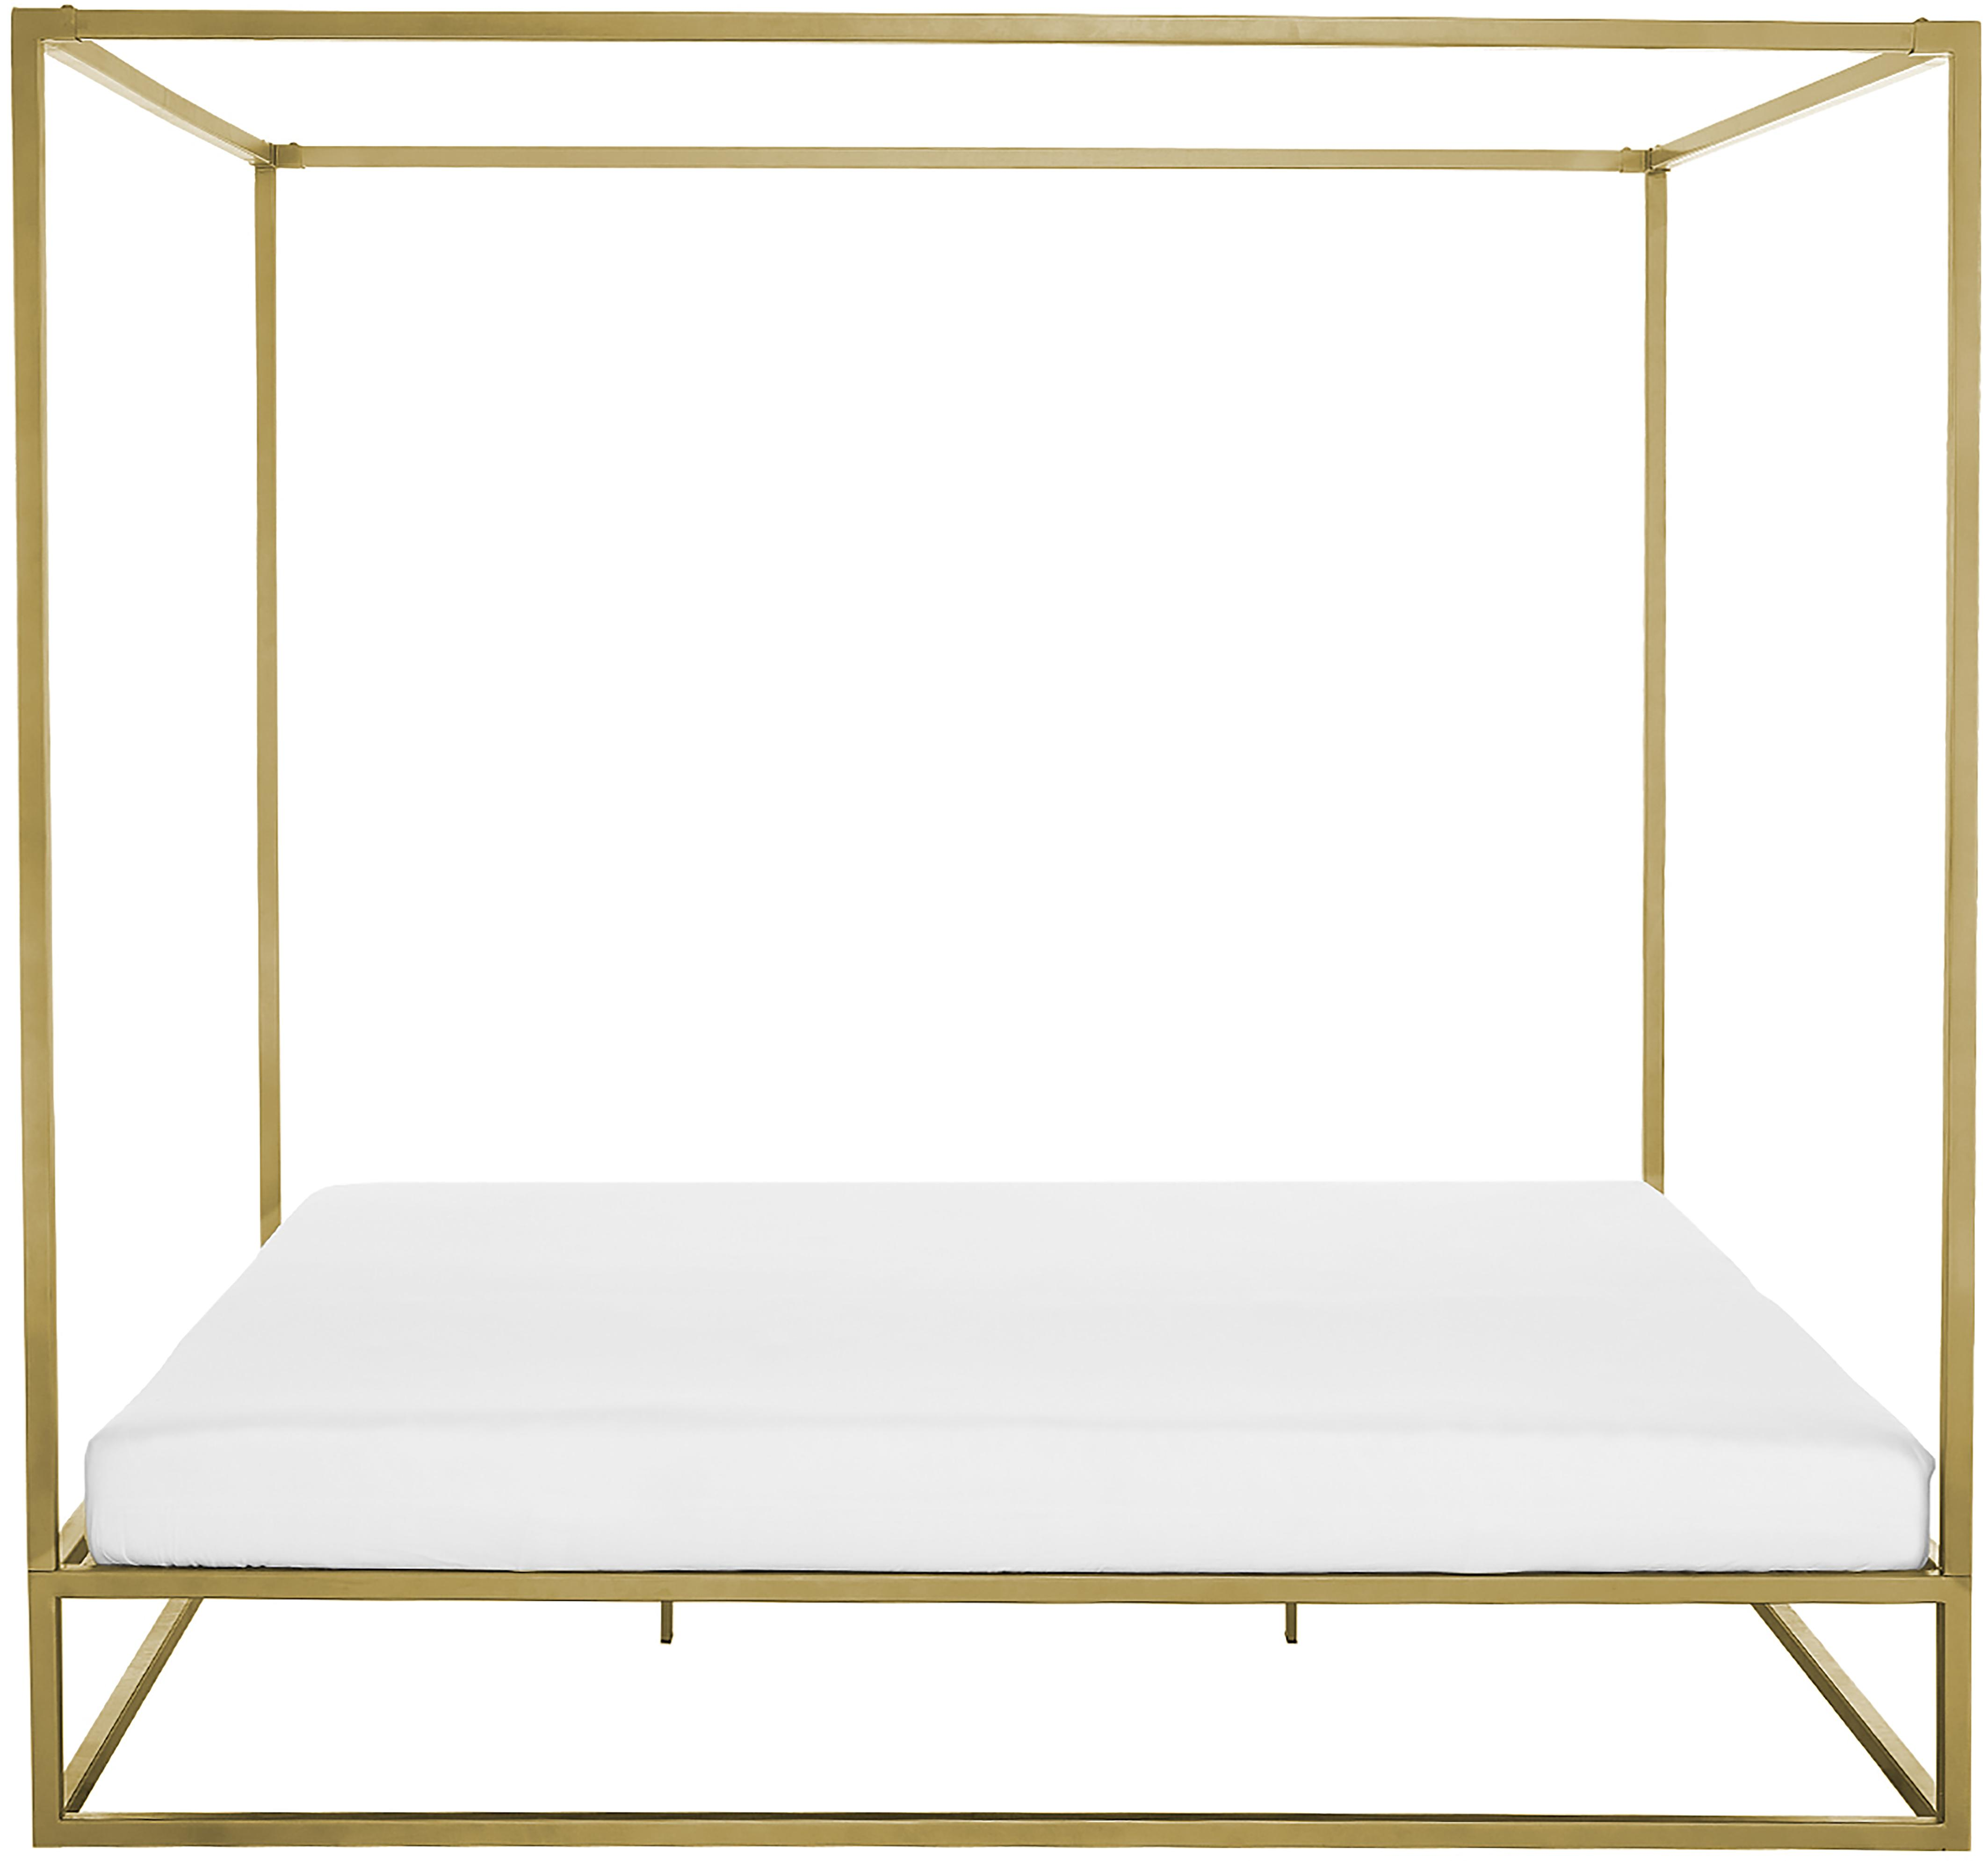 Letto a baldacchino Belle, Metallo ottonato, Dorato opaco, 160 x 200 cm